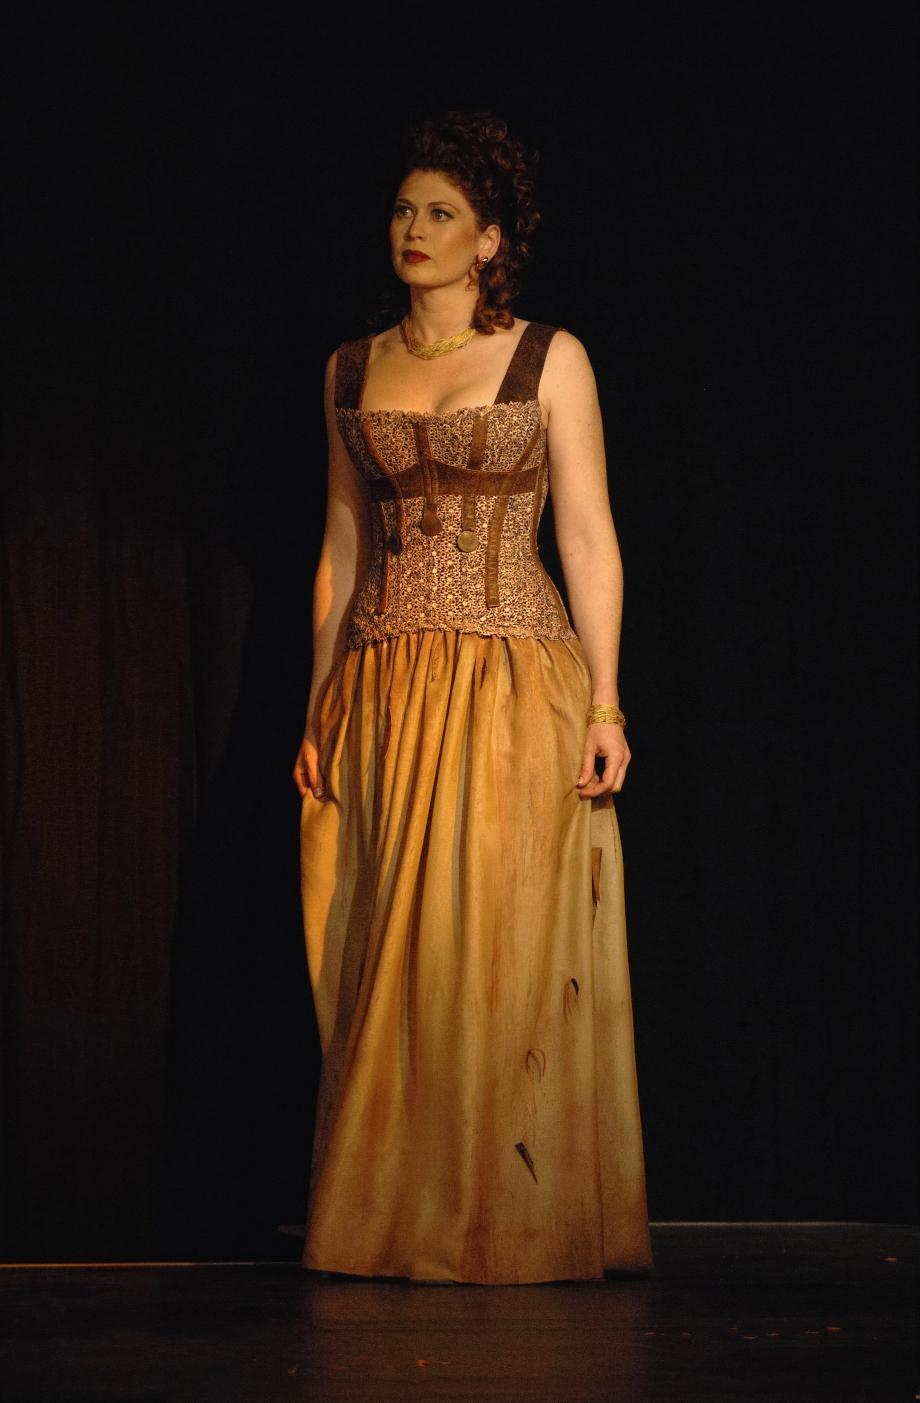 Barbara als Messalina Marc Zander 2016 b